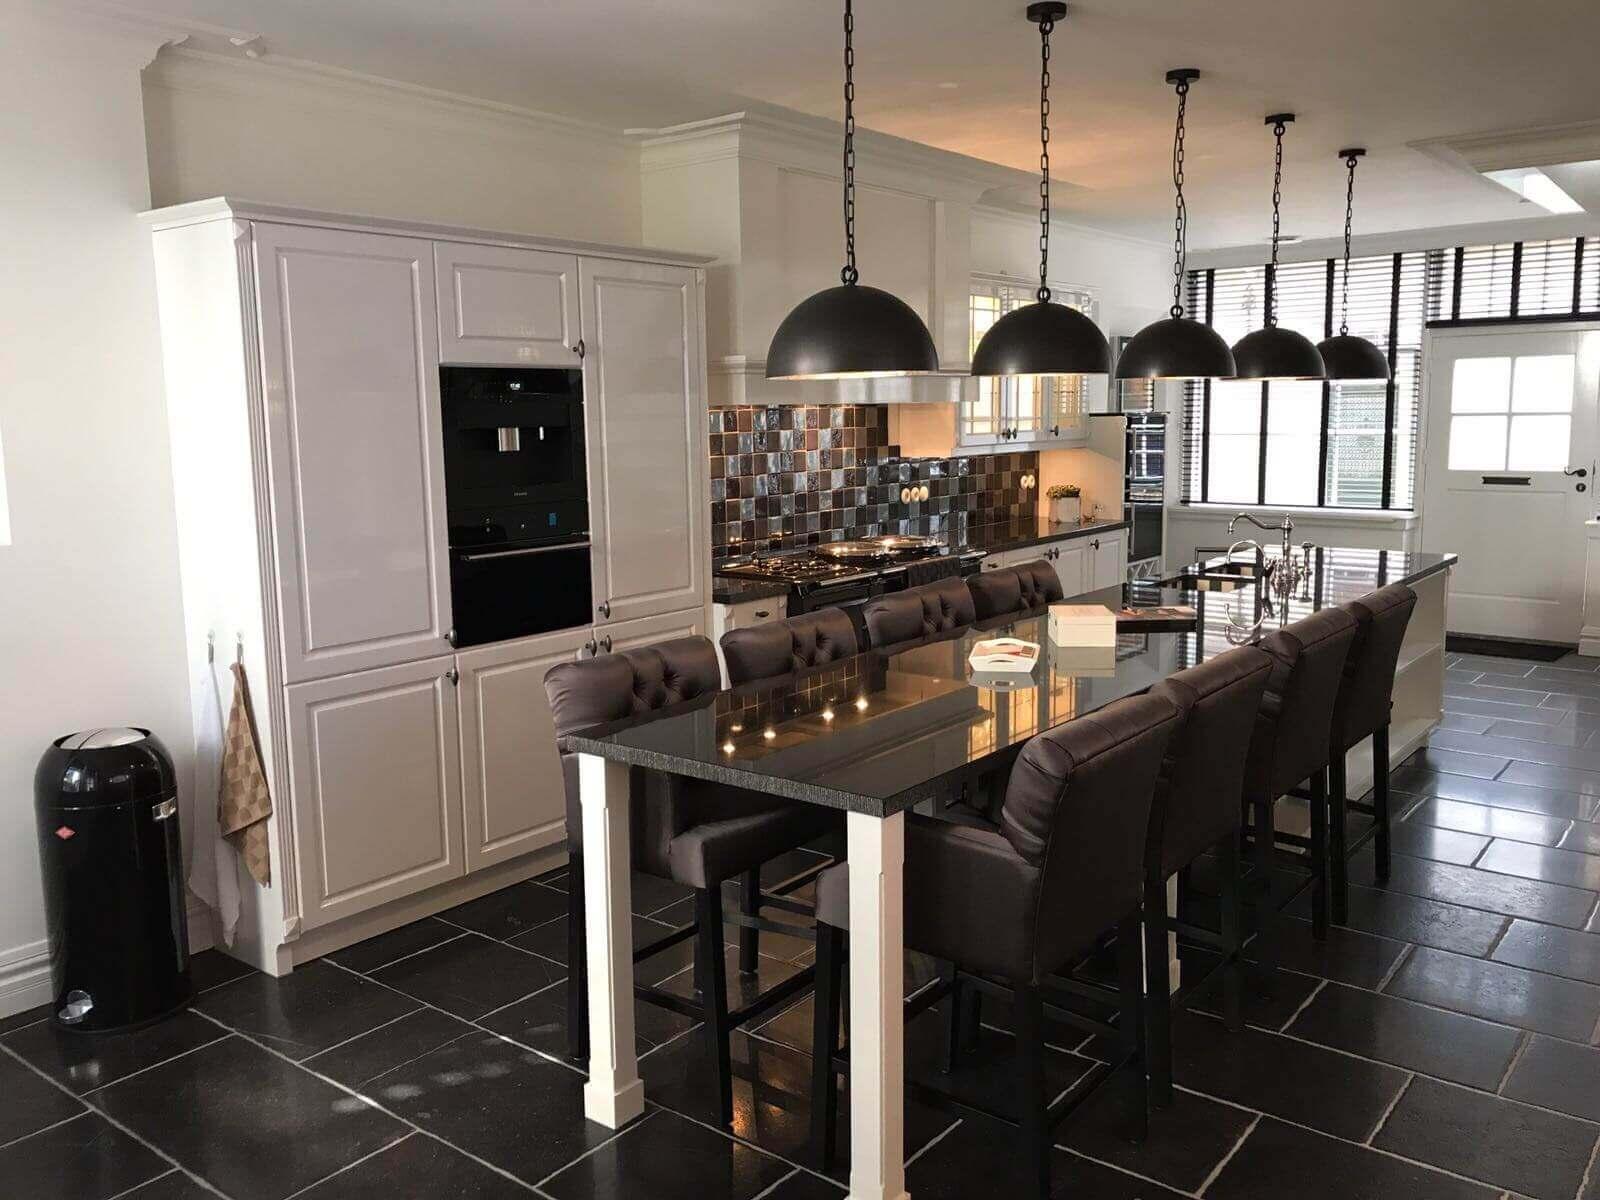 Witte keuken met krachtige opstelling